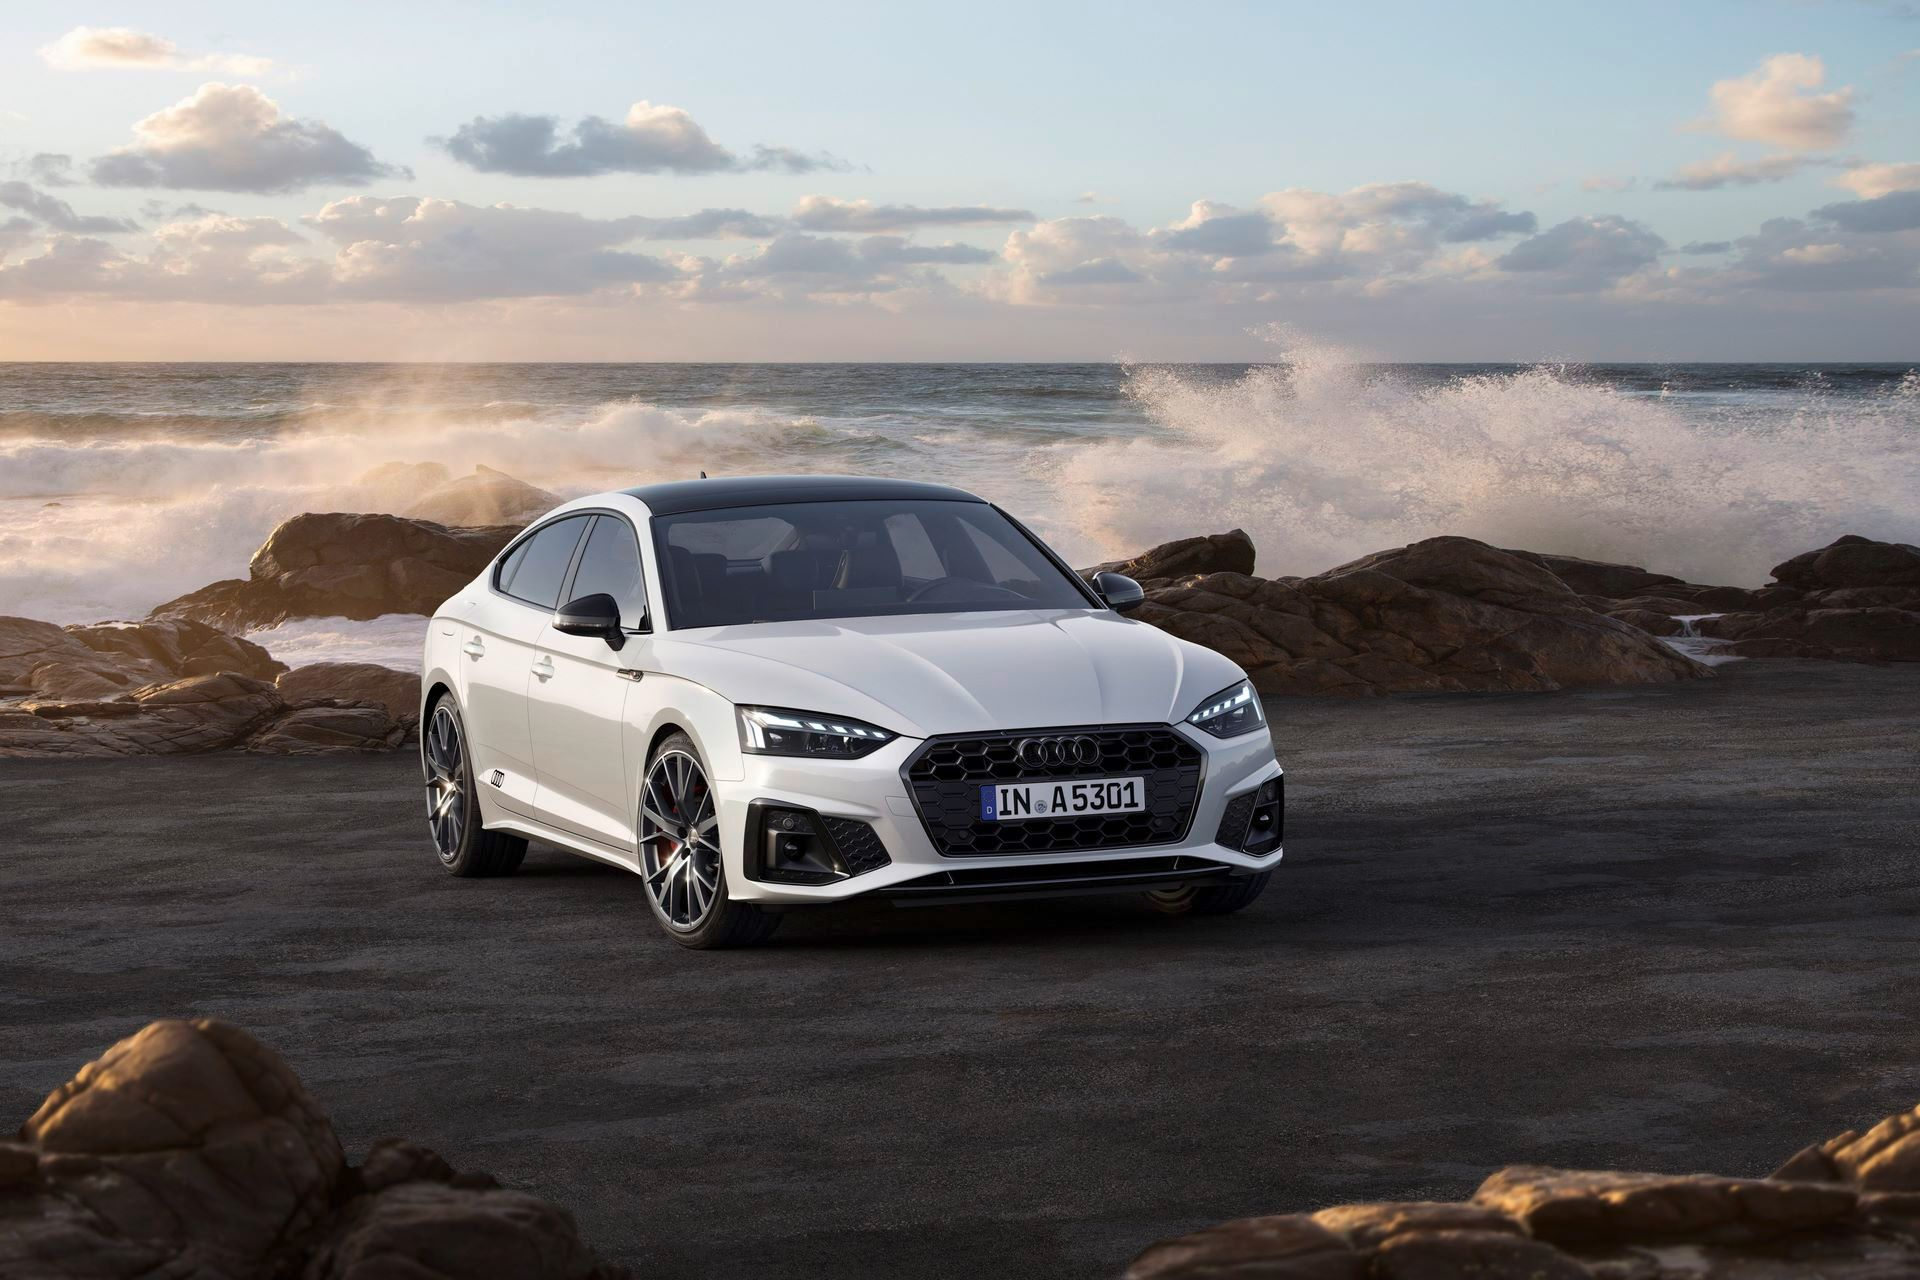 Audi-A4-A5-Q7-Q8-Competition-And-Competition-Plus-Trims-65